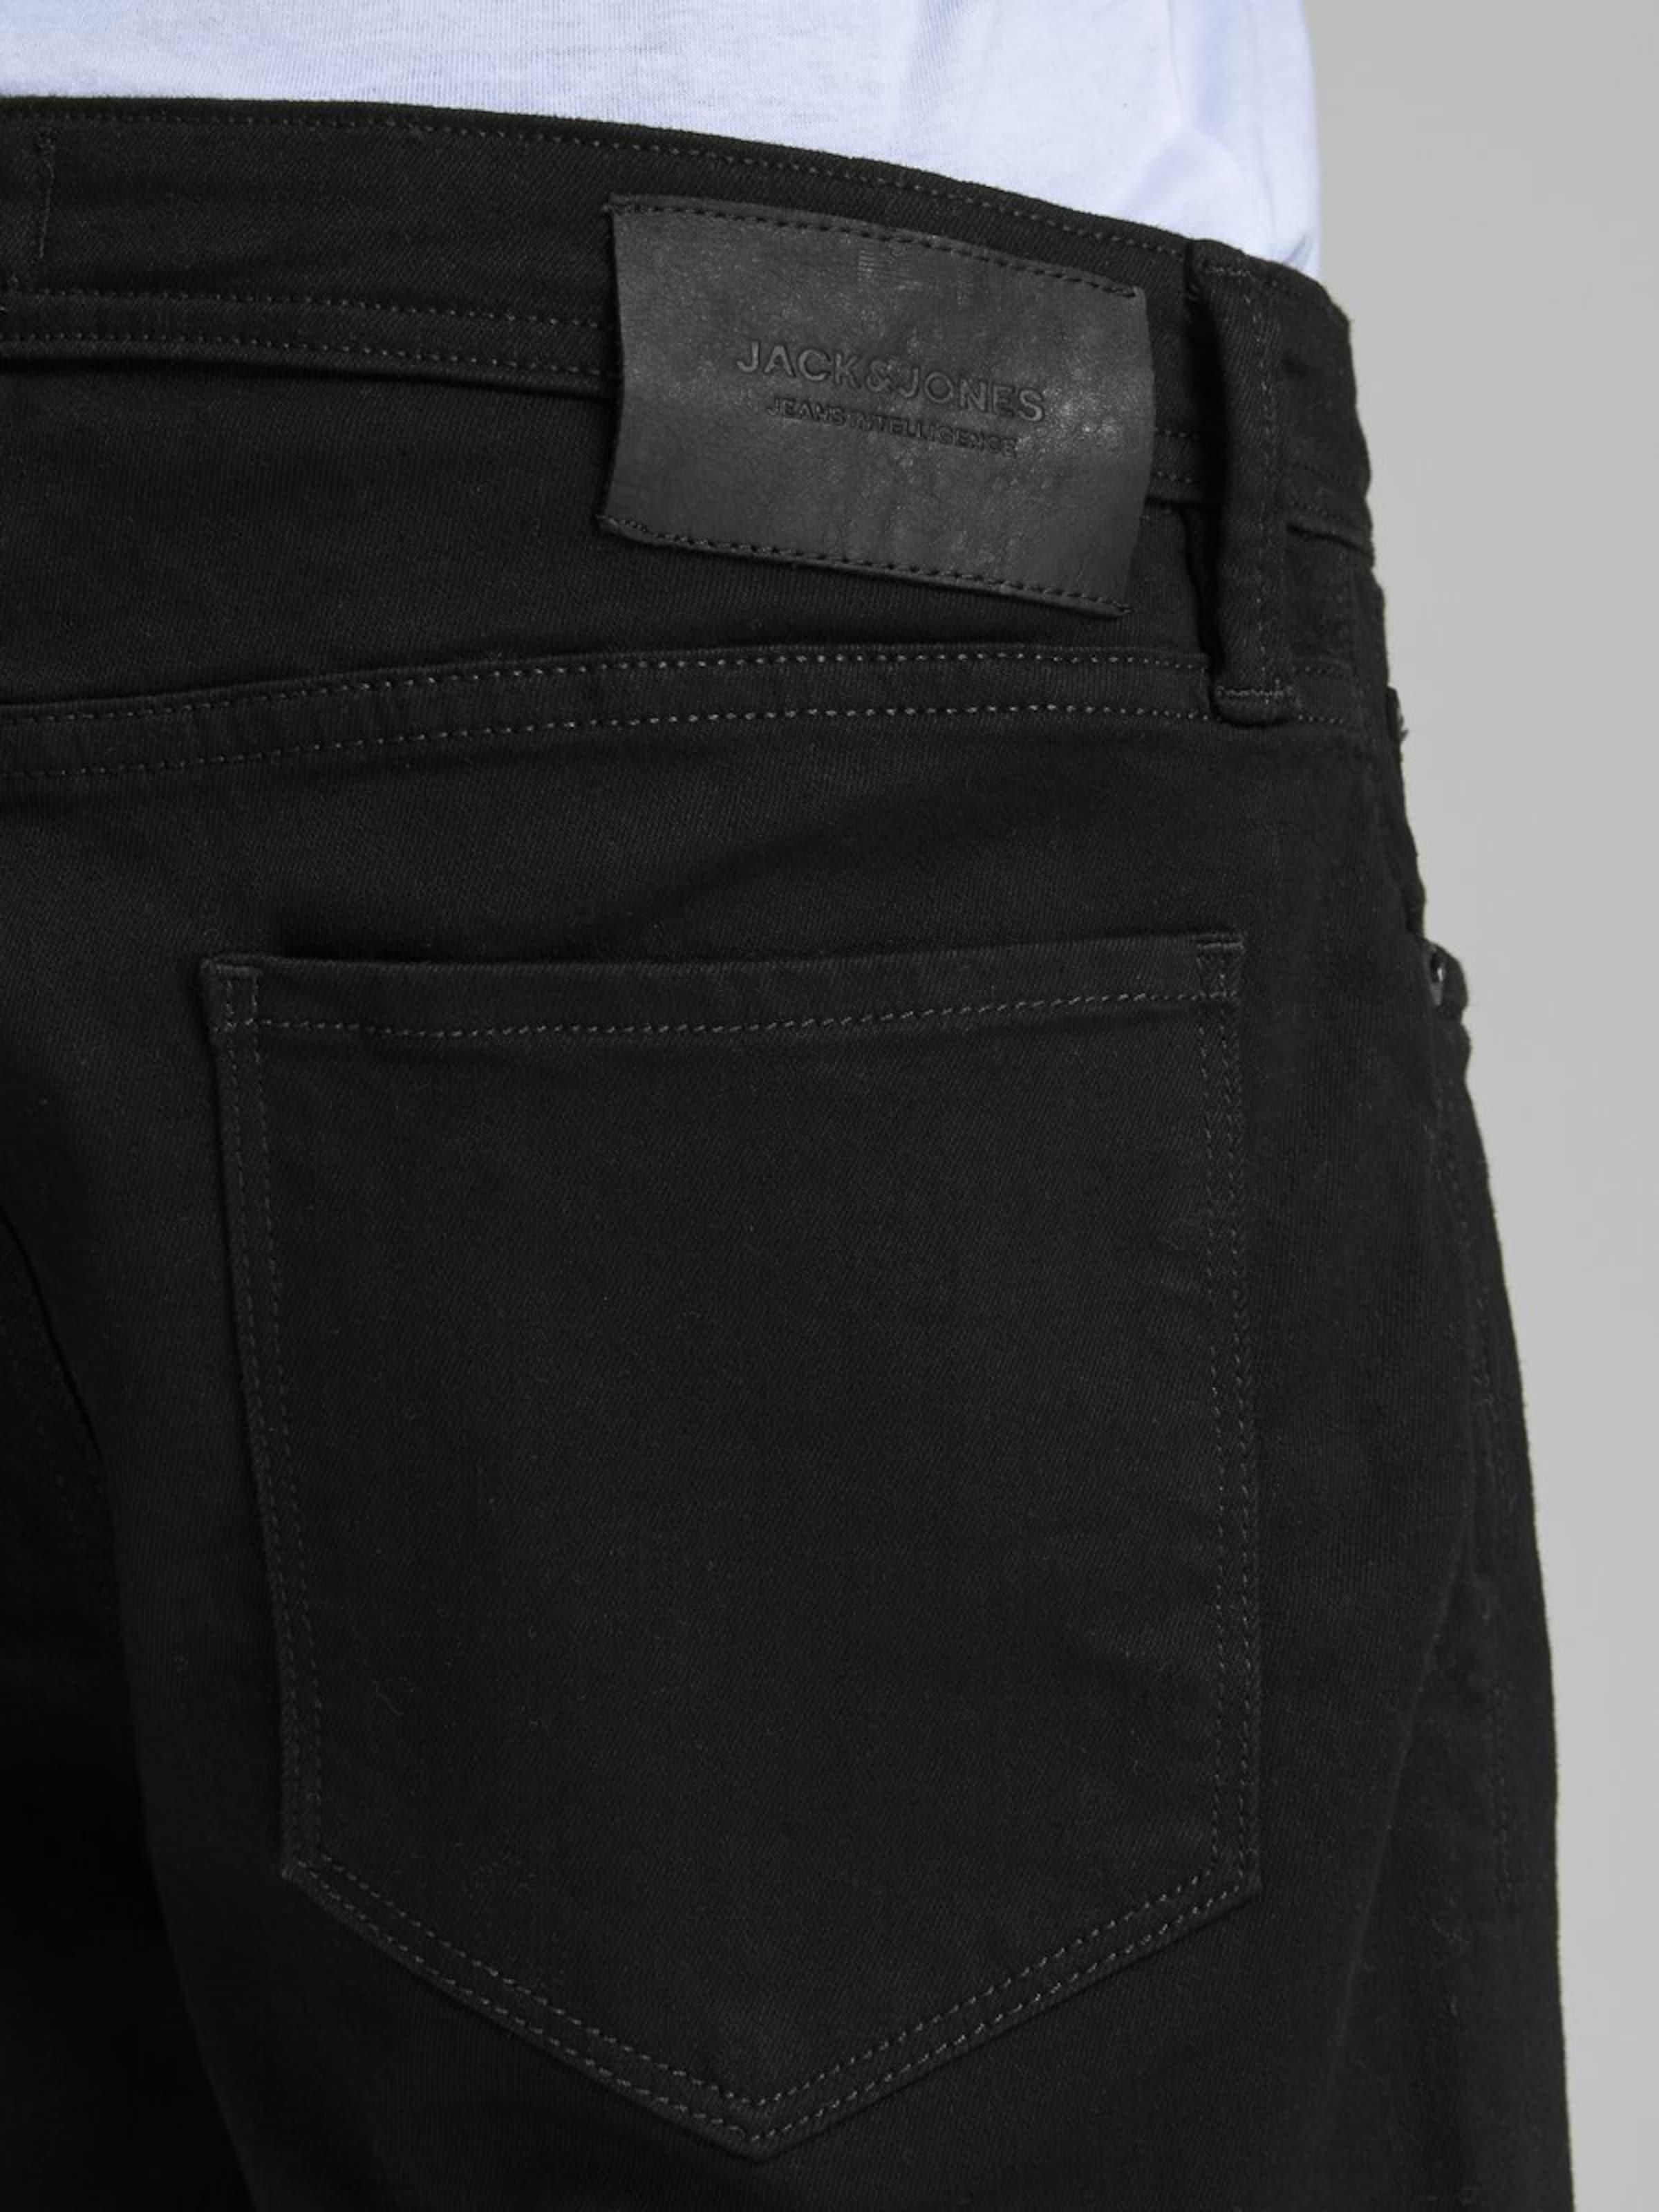 Jackamp; In Jones Jeansshorts Black Denim Superstretch hdsQtr